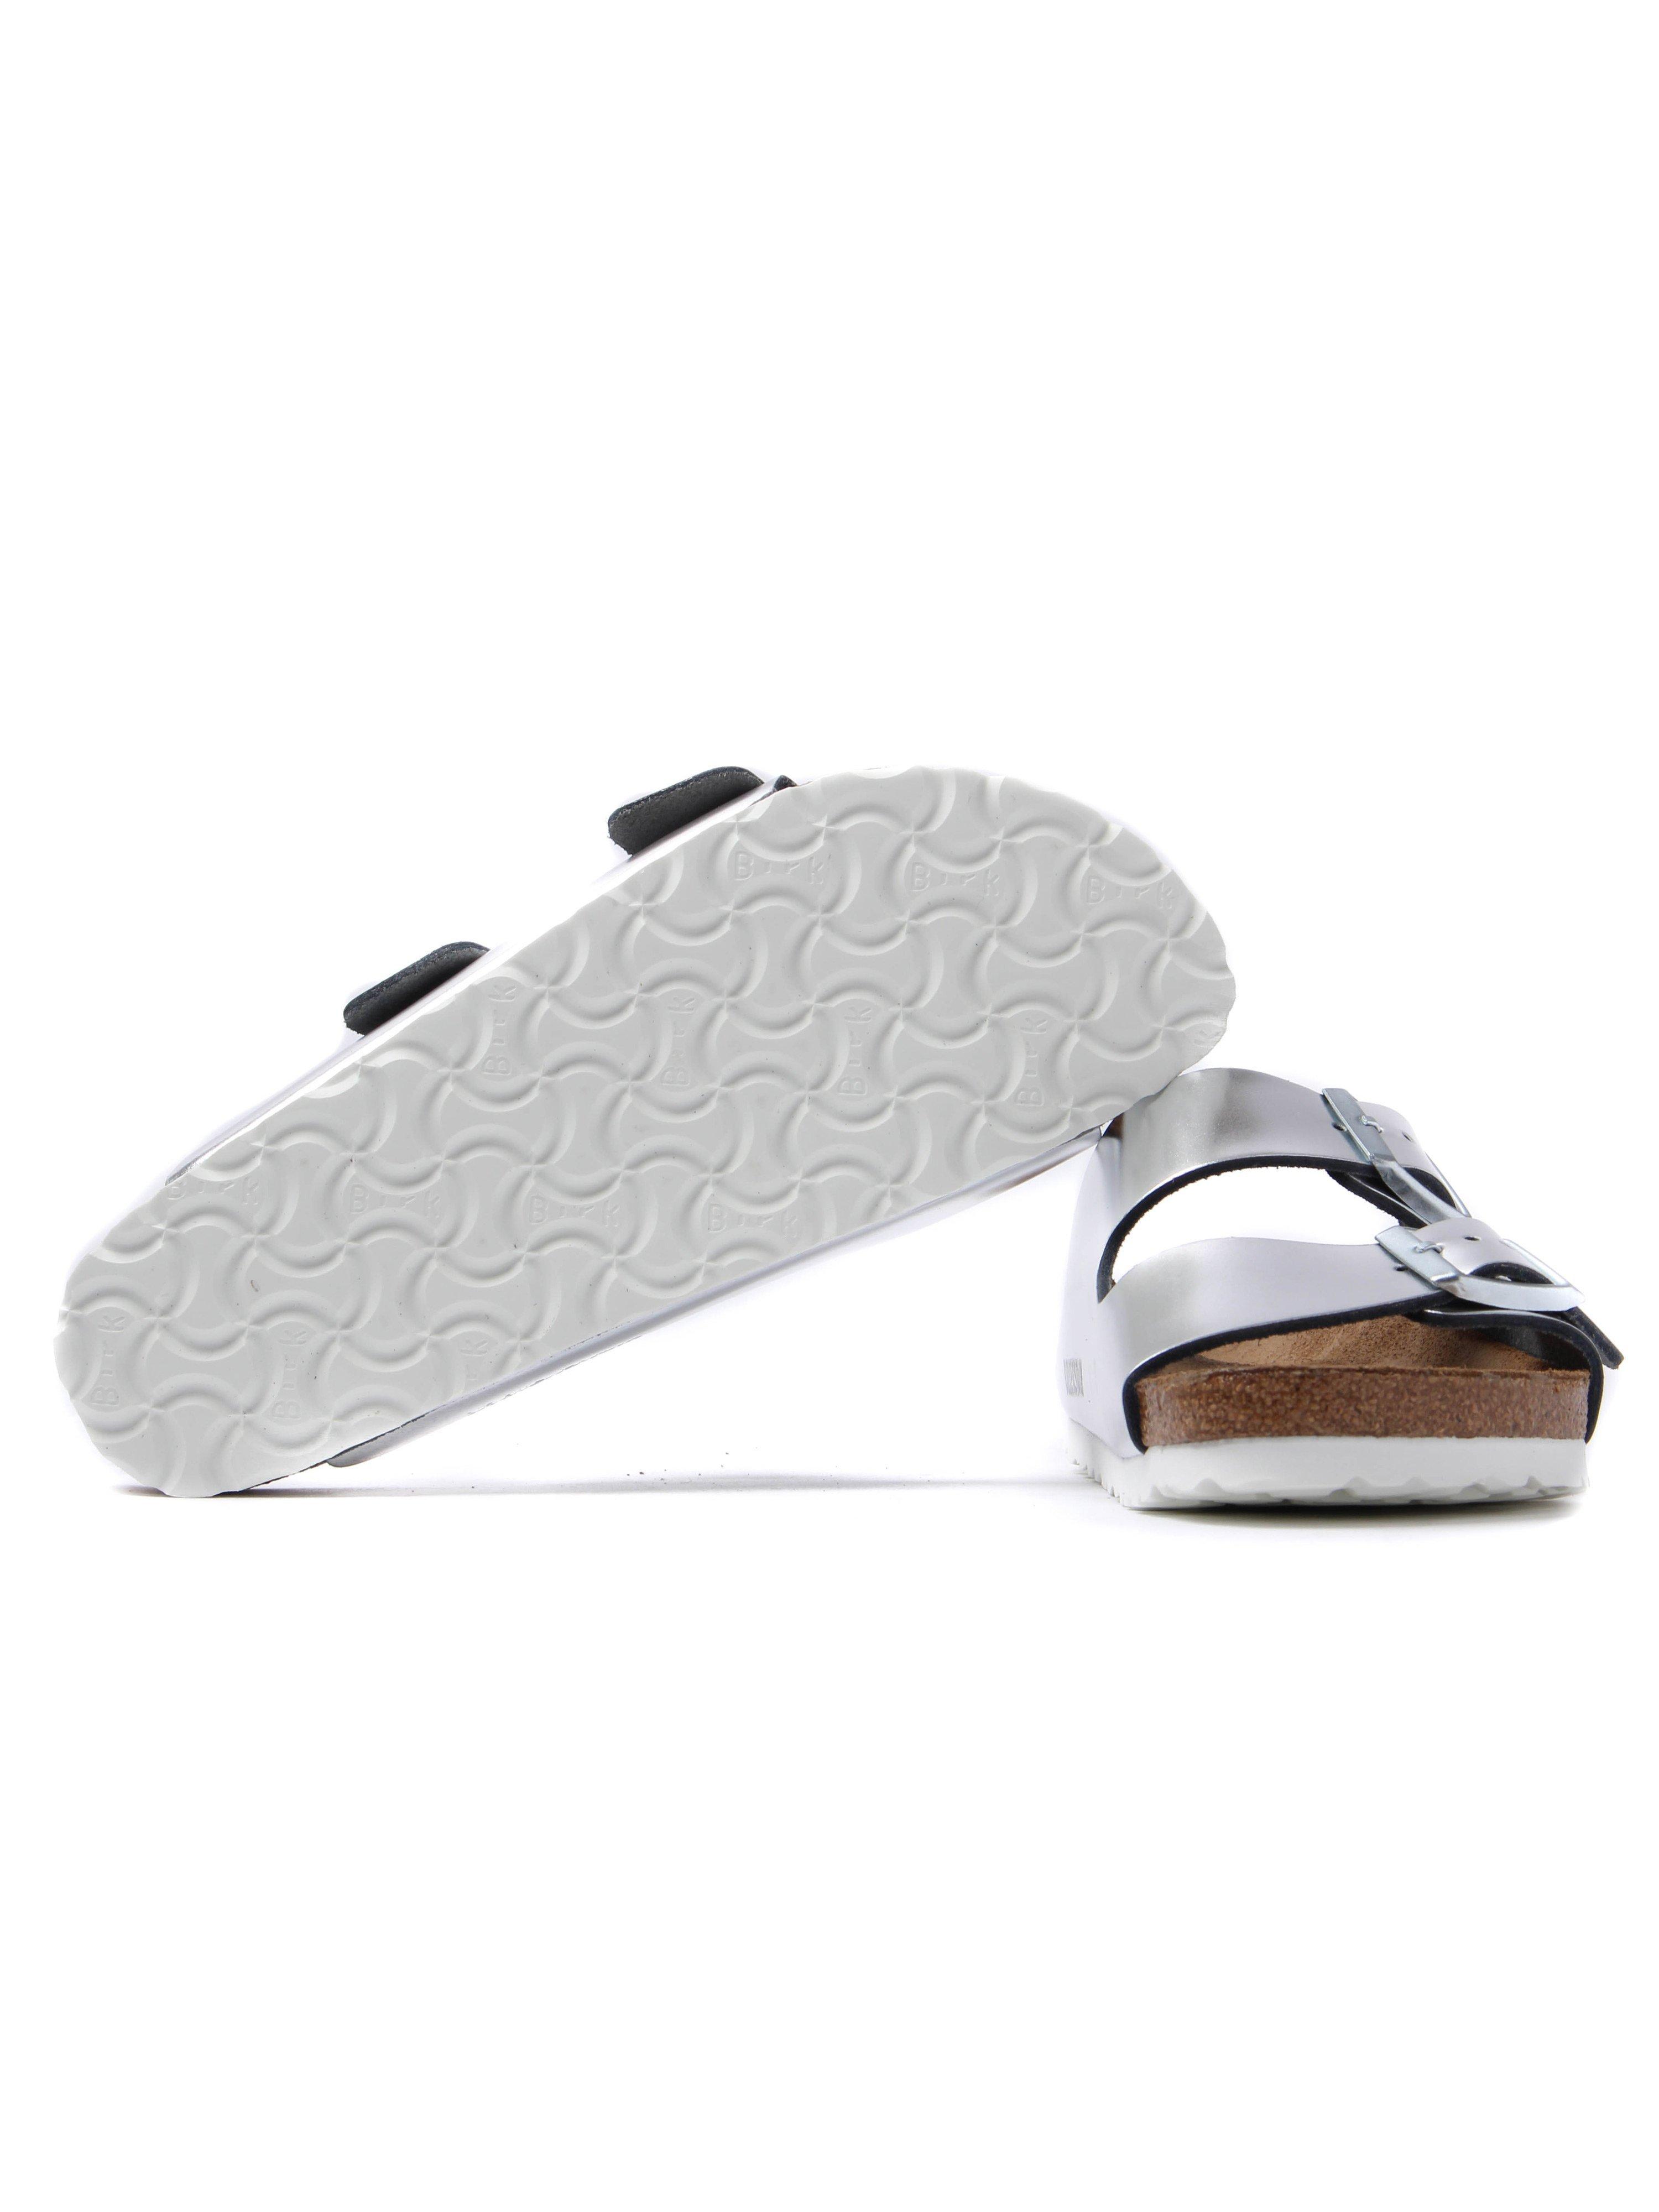 Birkenstock Women's Arizona Narrow Fit Leather Sandals - Silver